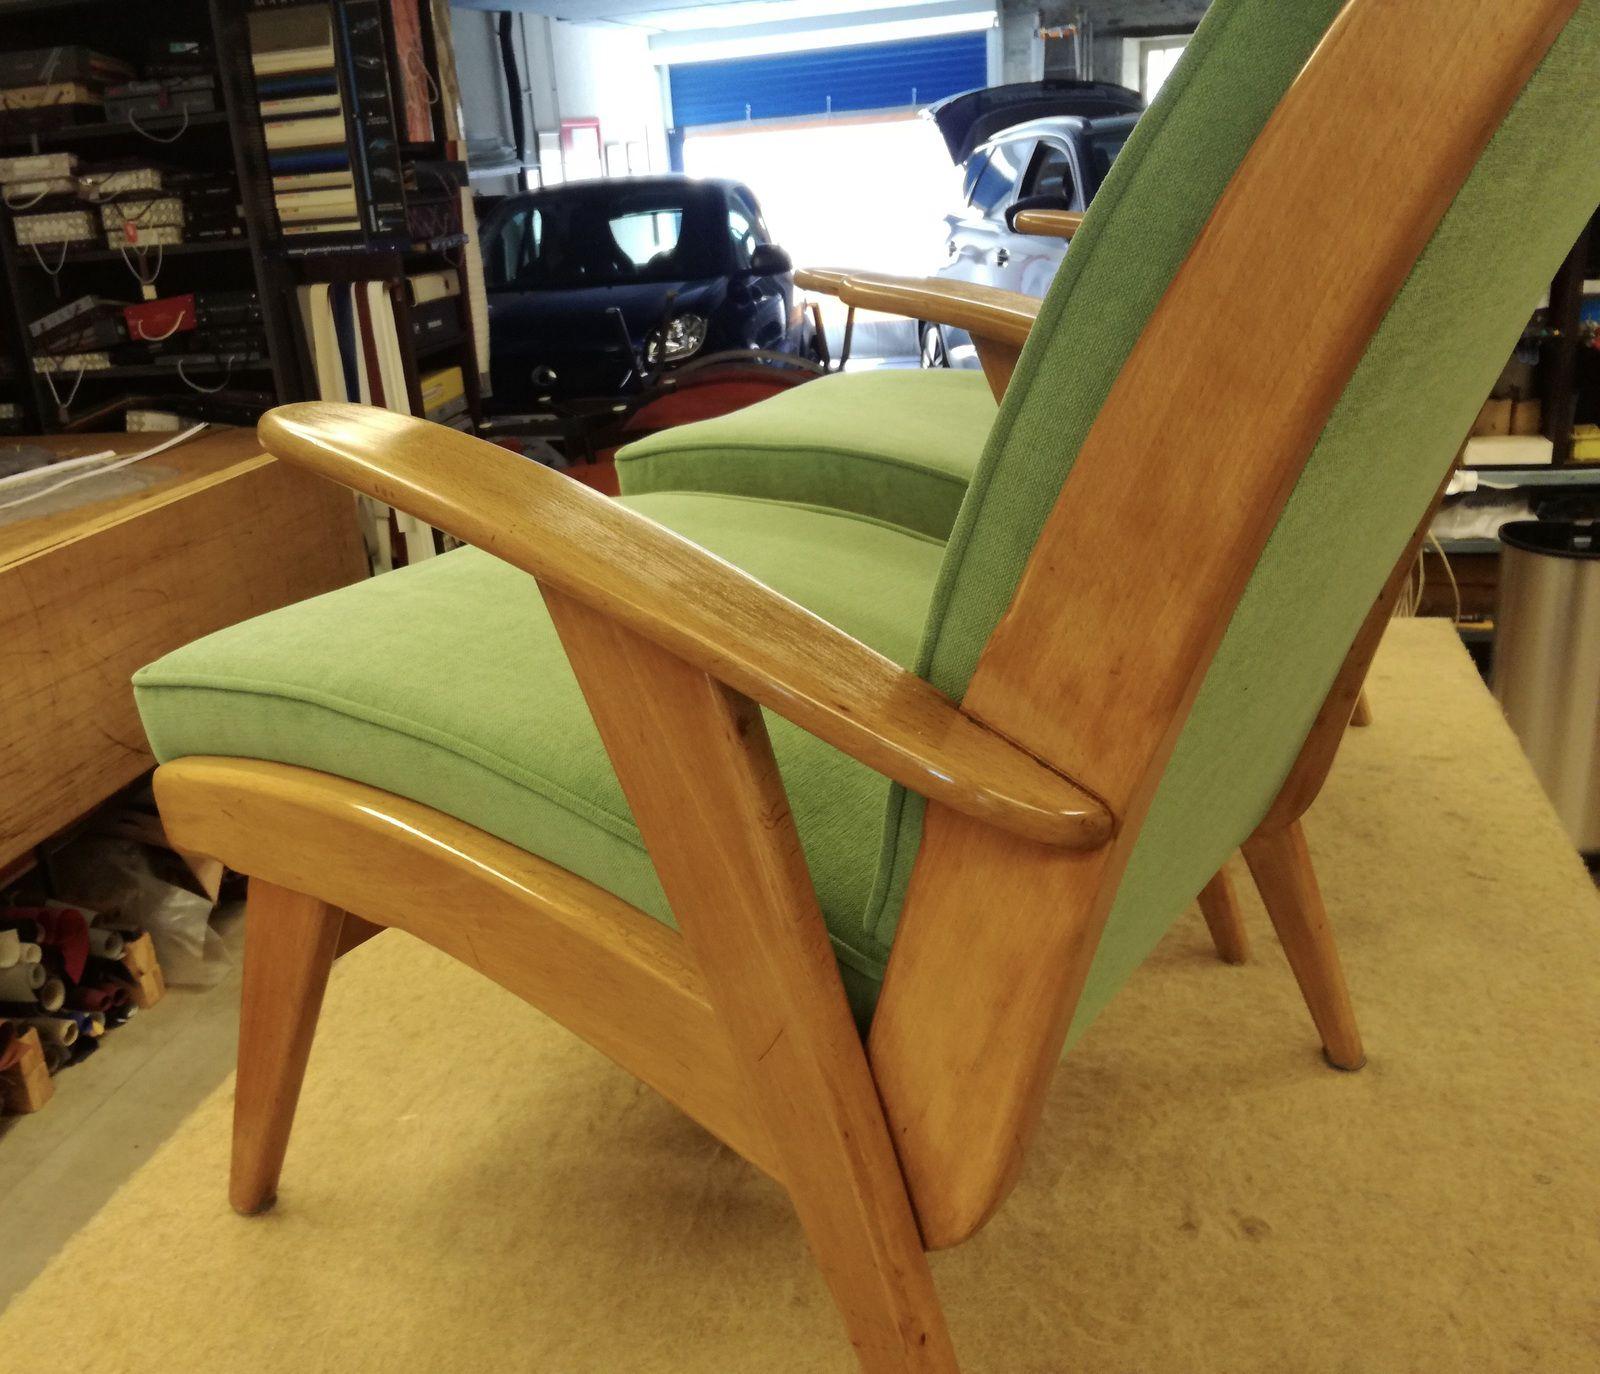 Artisan tapissier rénove vos fauteuils - Fouras